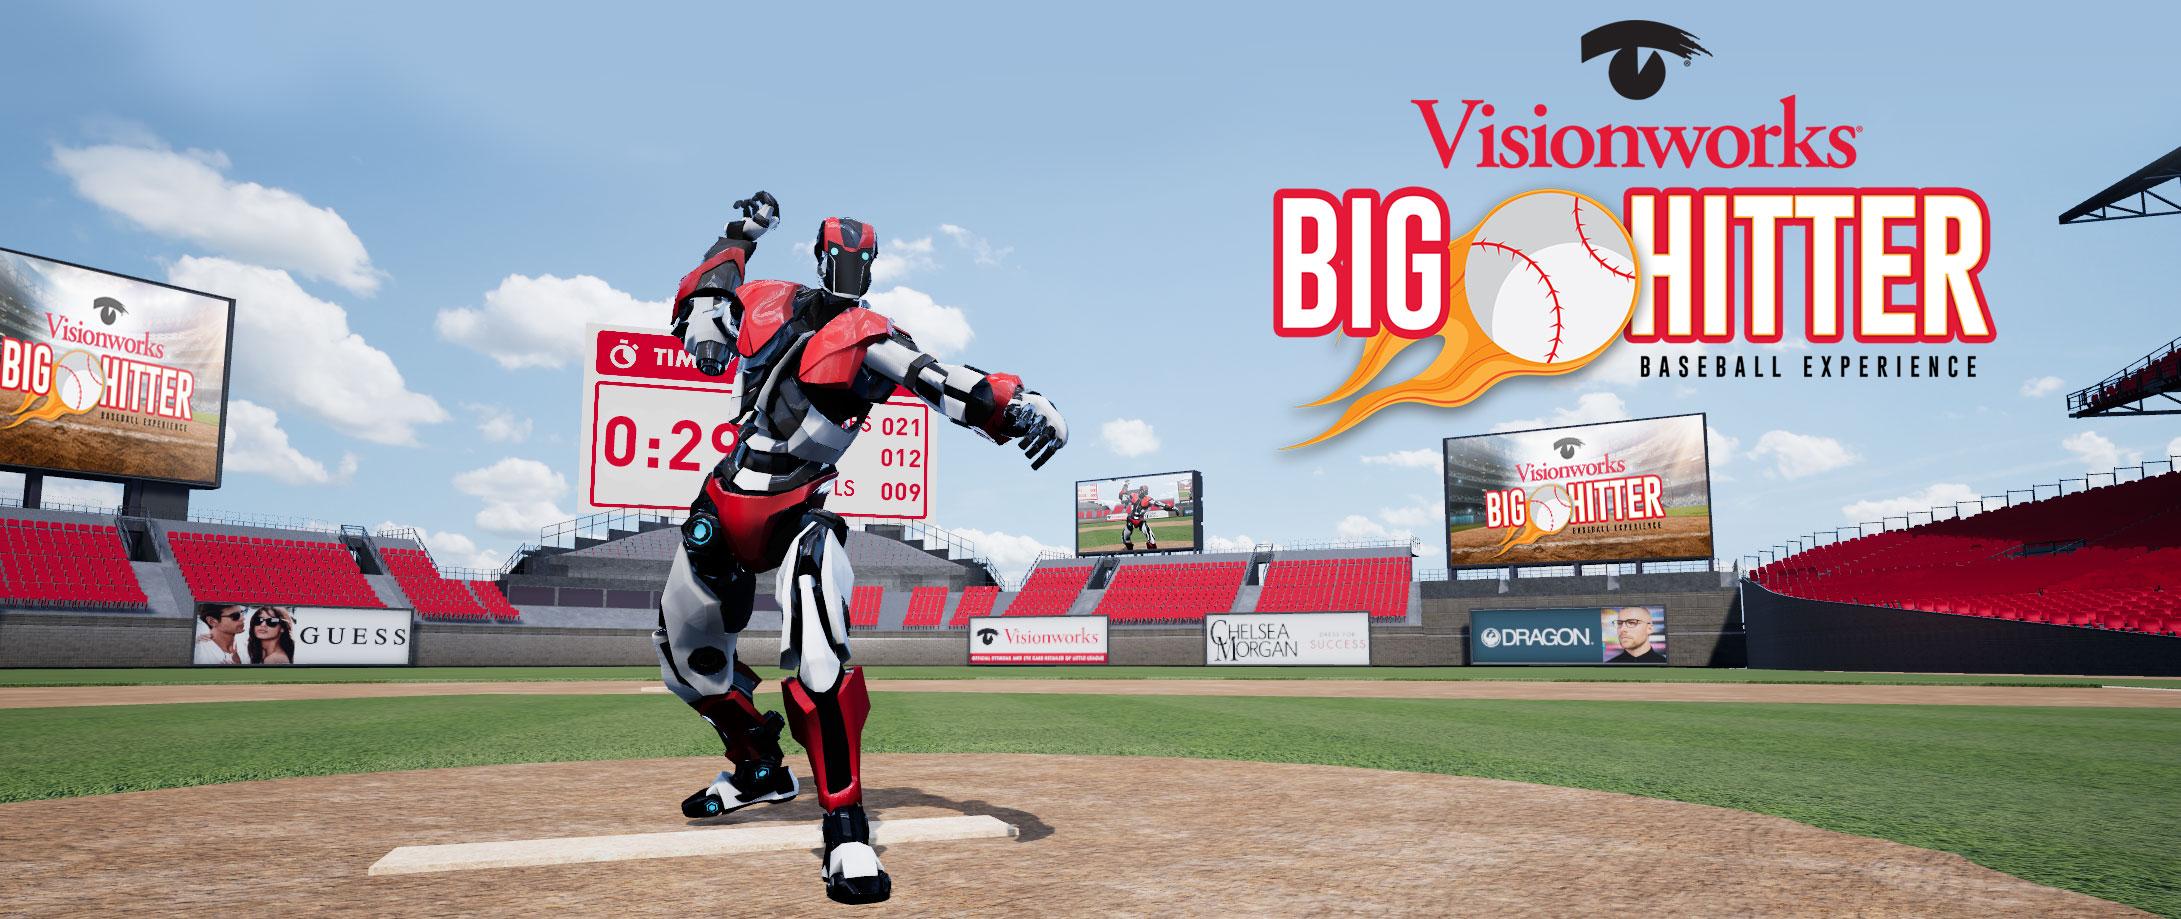 Visionworks VR Baseball